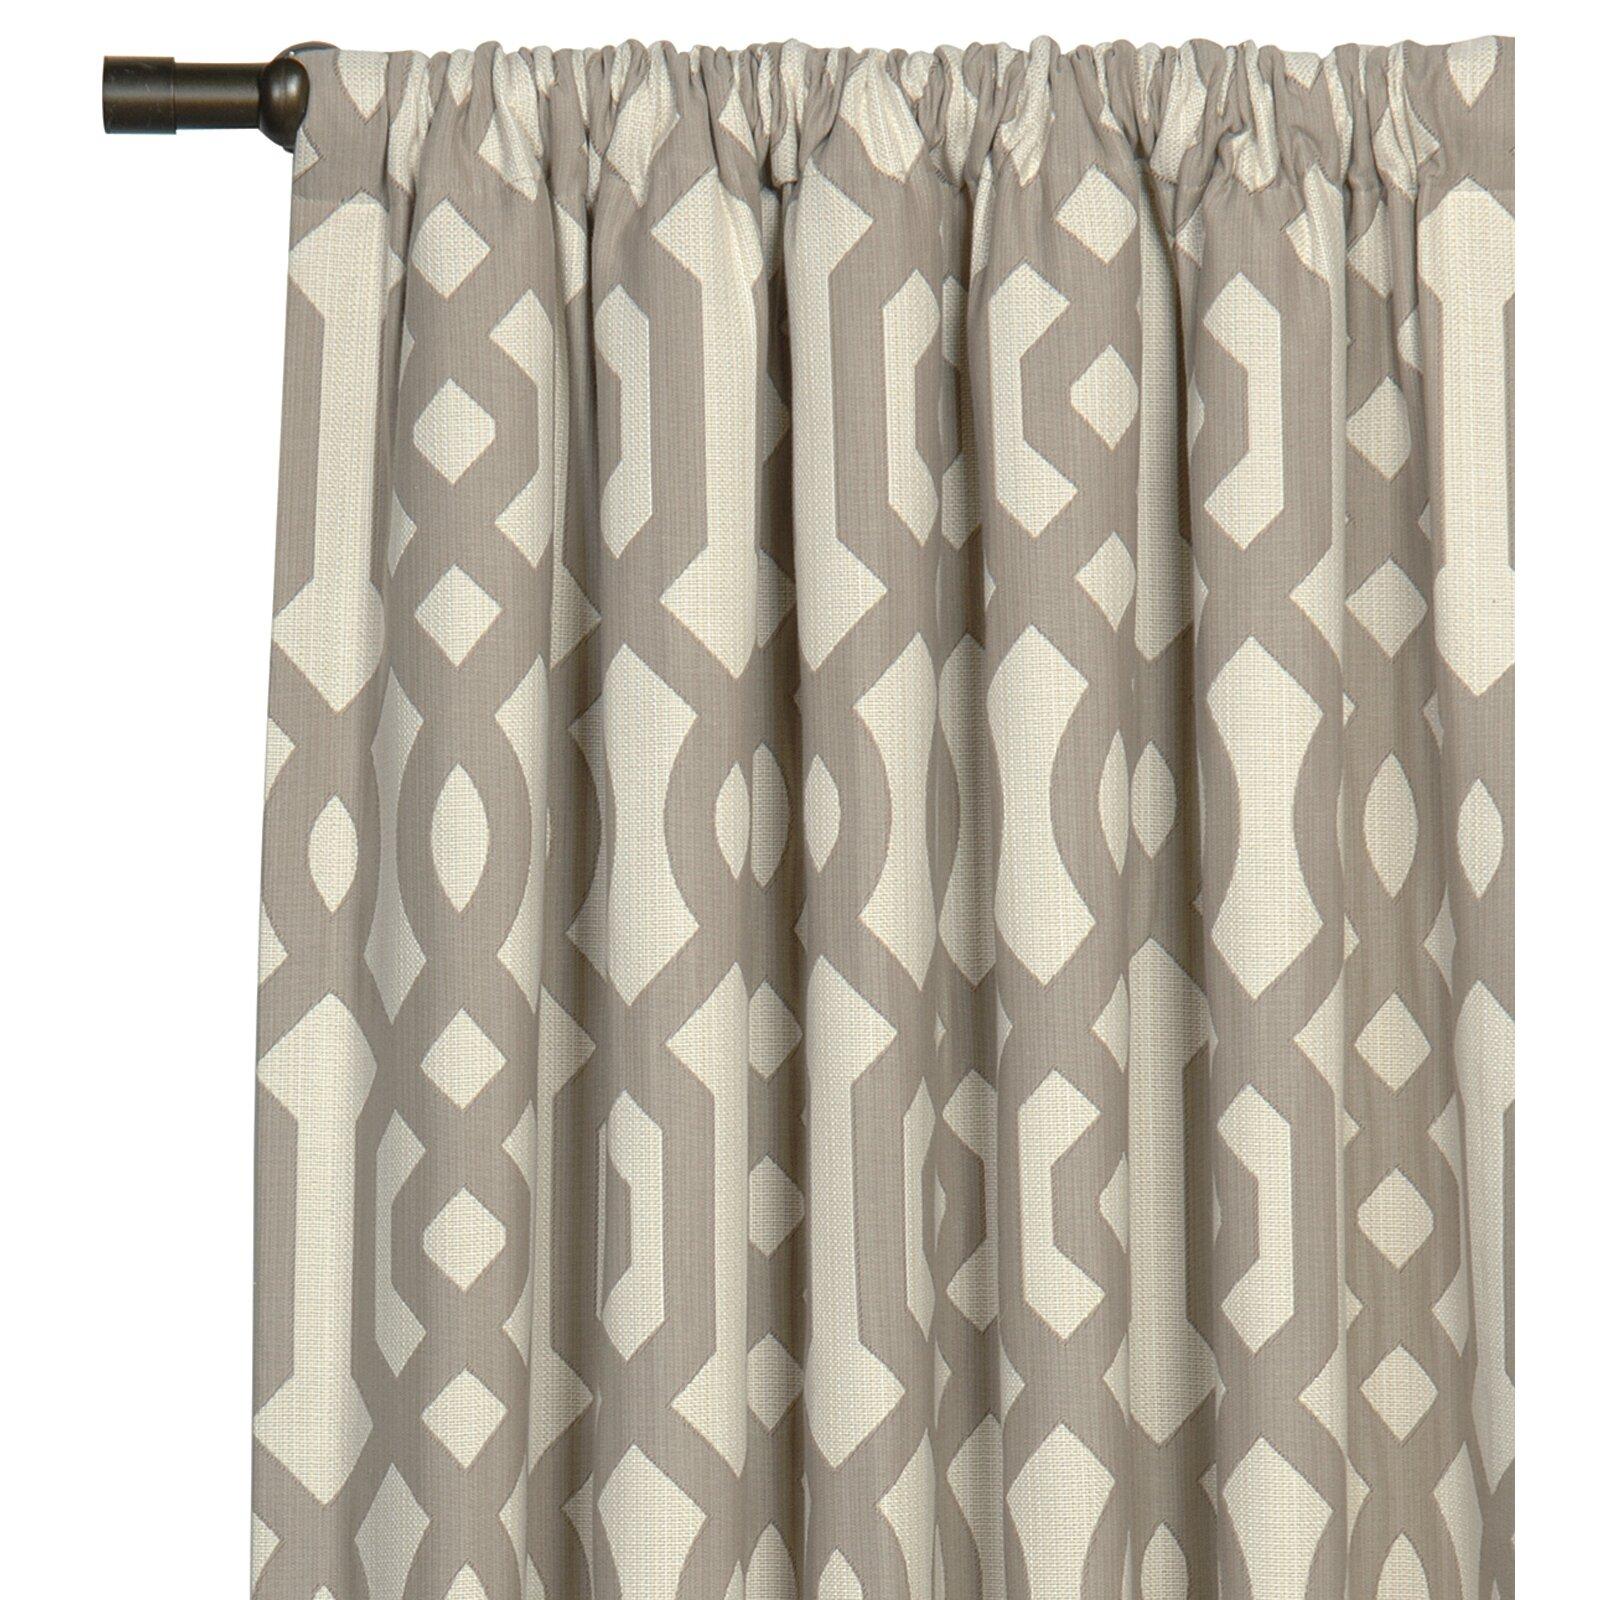 Back tab curtains on traverse rod - Amazoncom Best Home Fashion Thermal Insulated Blackout Curtains Back Tab Rod Pocket Black X No Tie Backs Set Of 2 Panels Home U0026amp